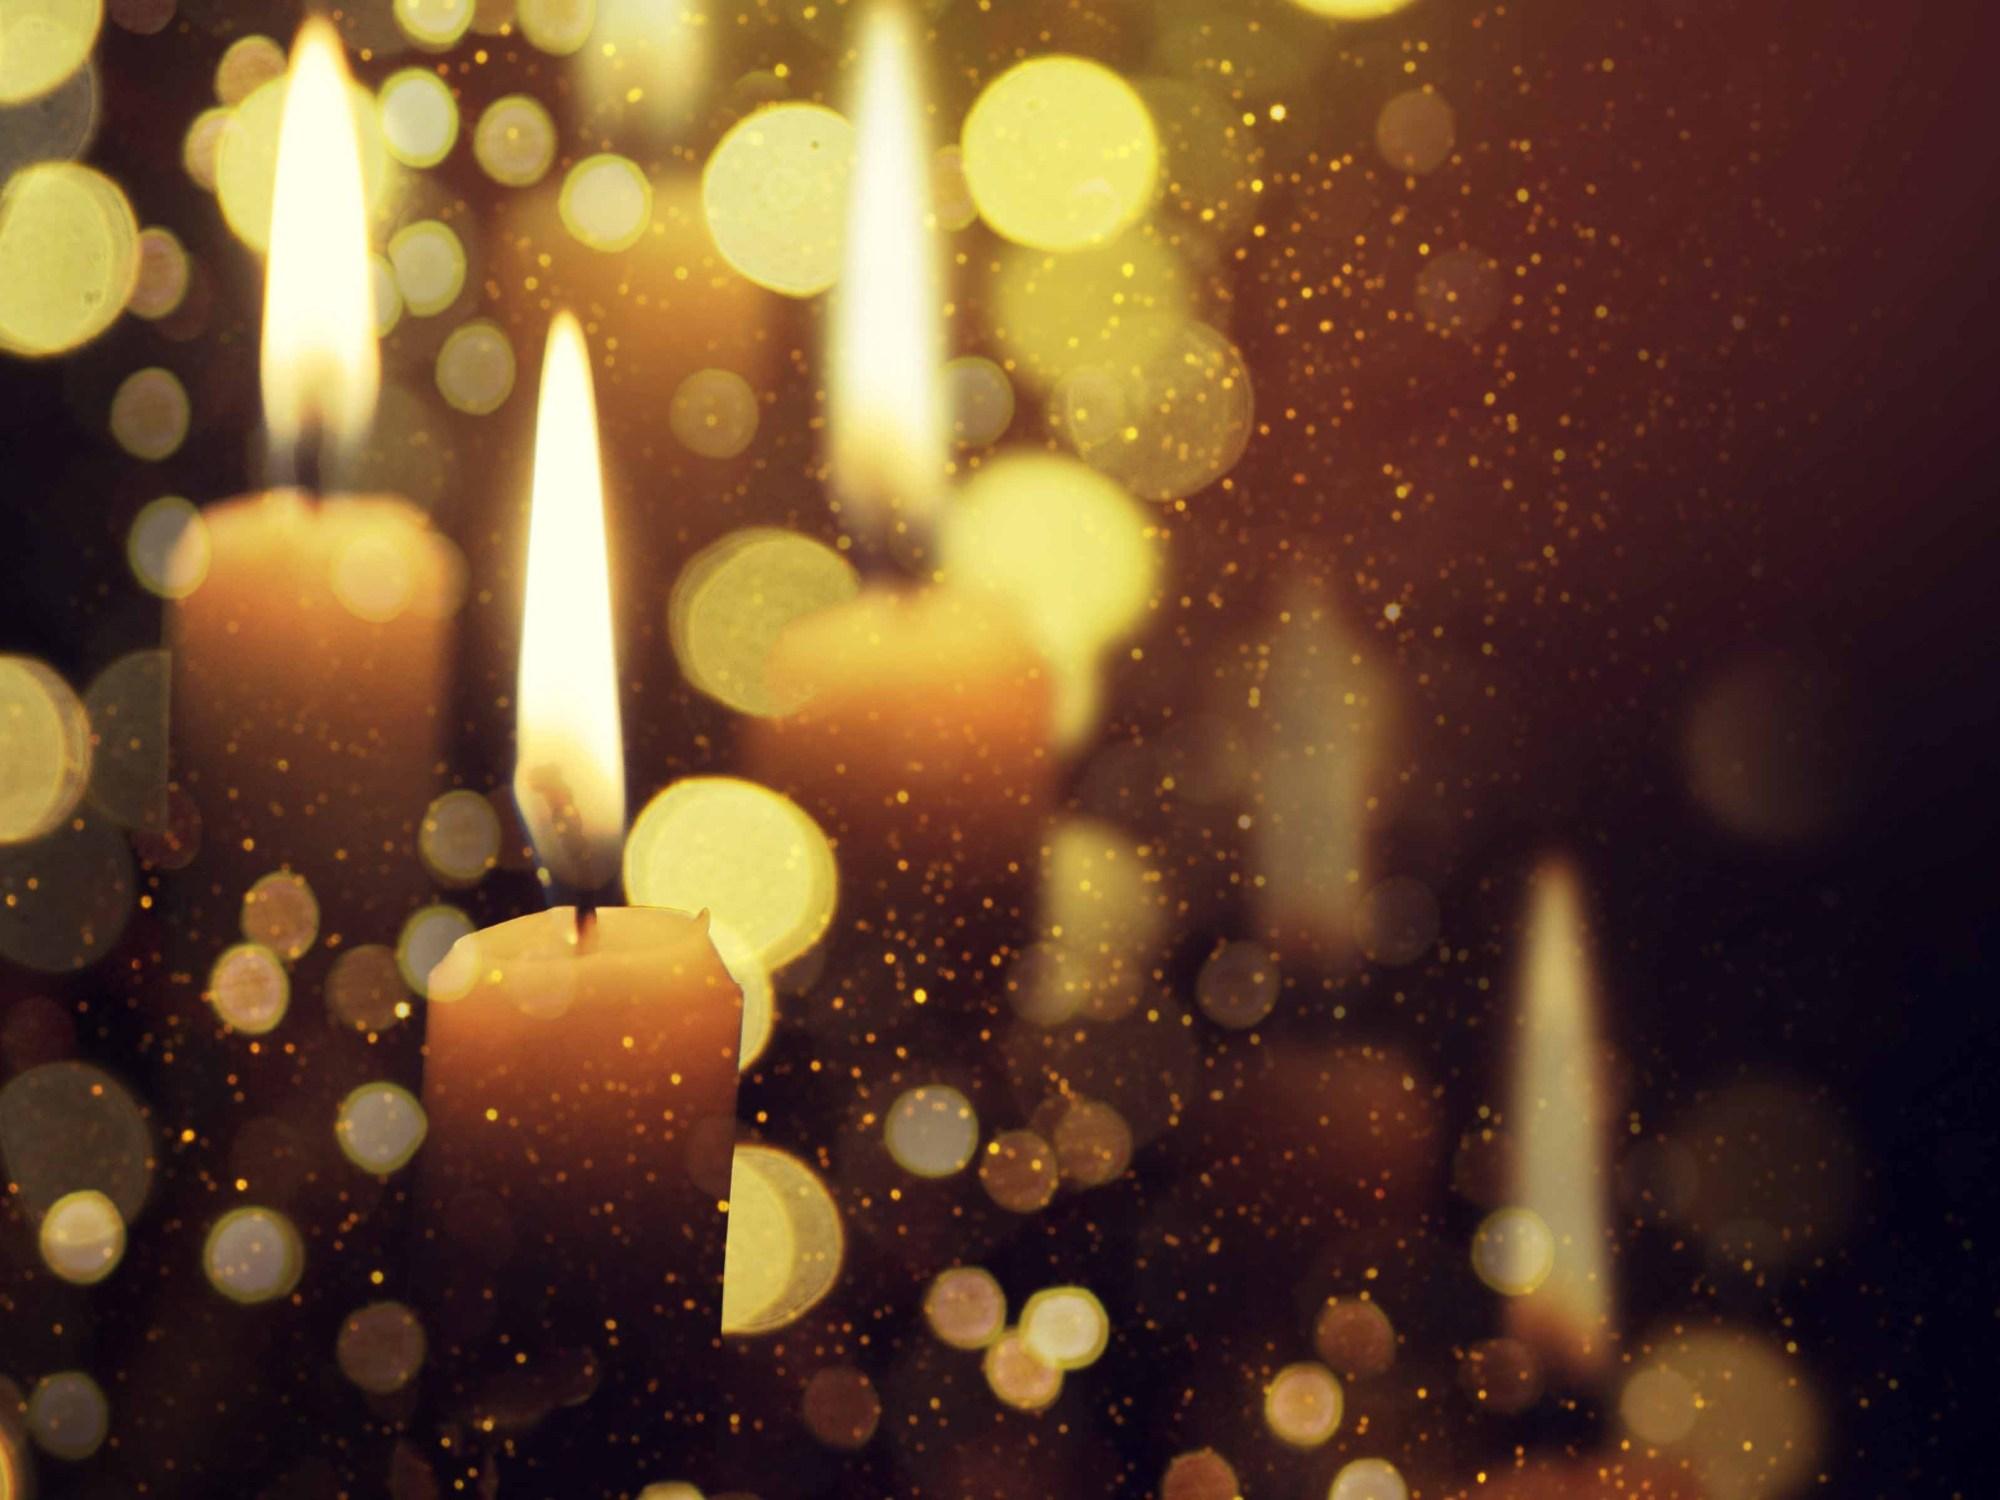 hight resolution of celebrate winter holidays